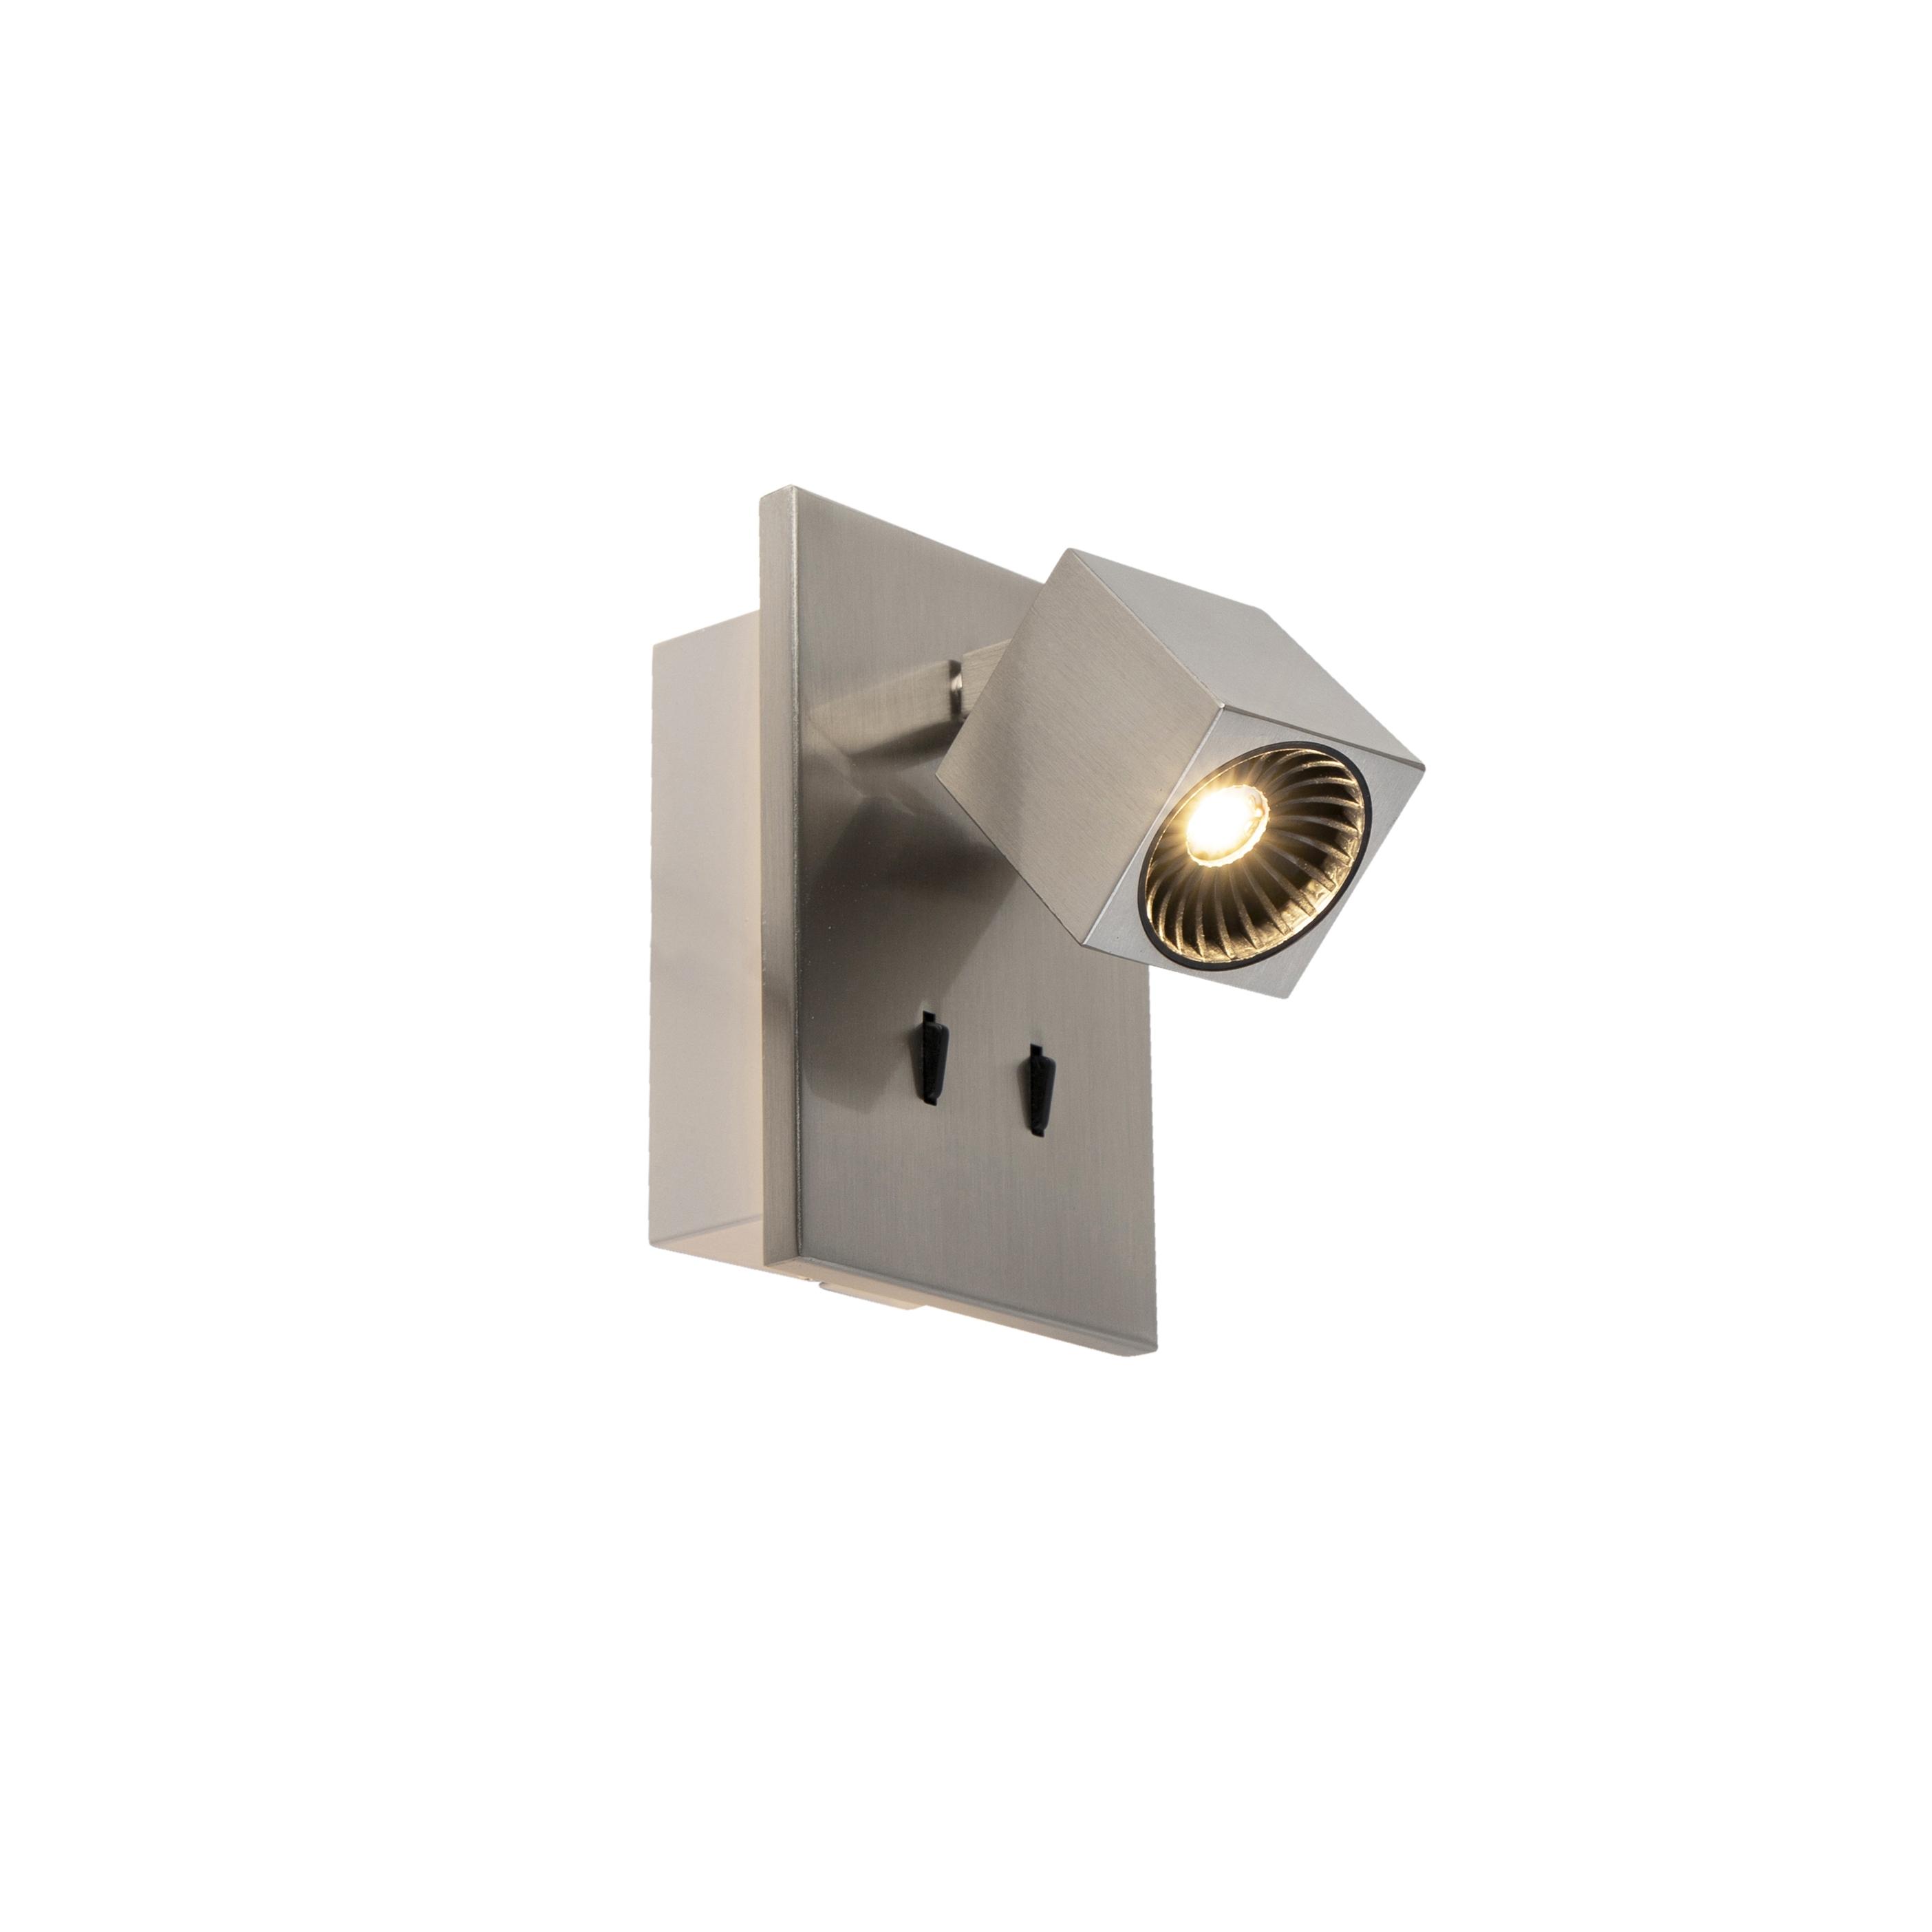 Moderne wandlamp staal incl. LED kantelbaar - Cupra